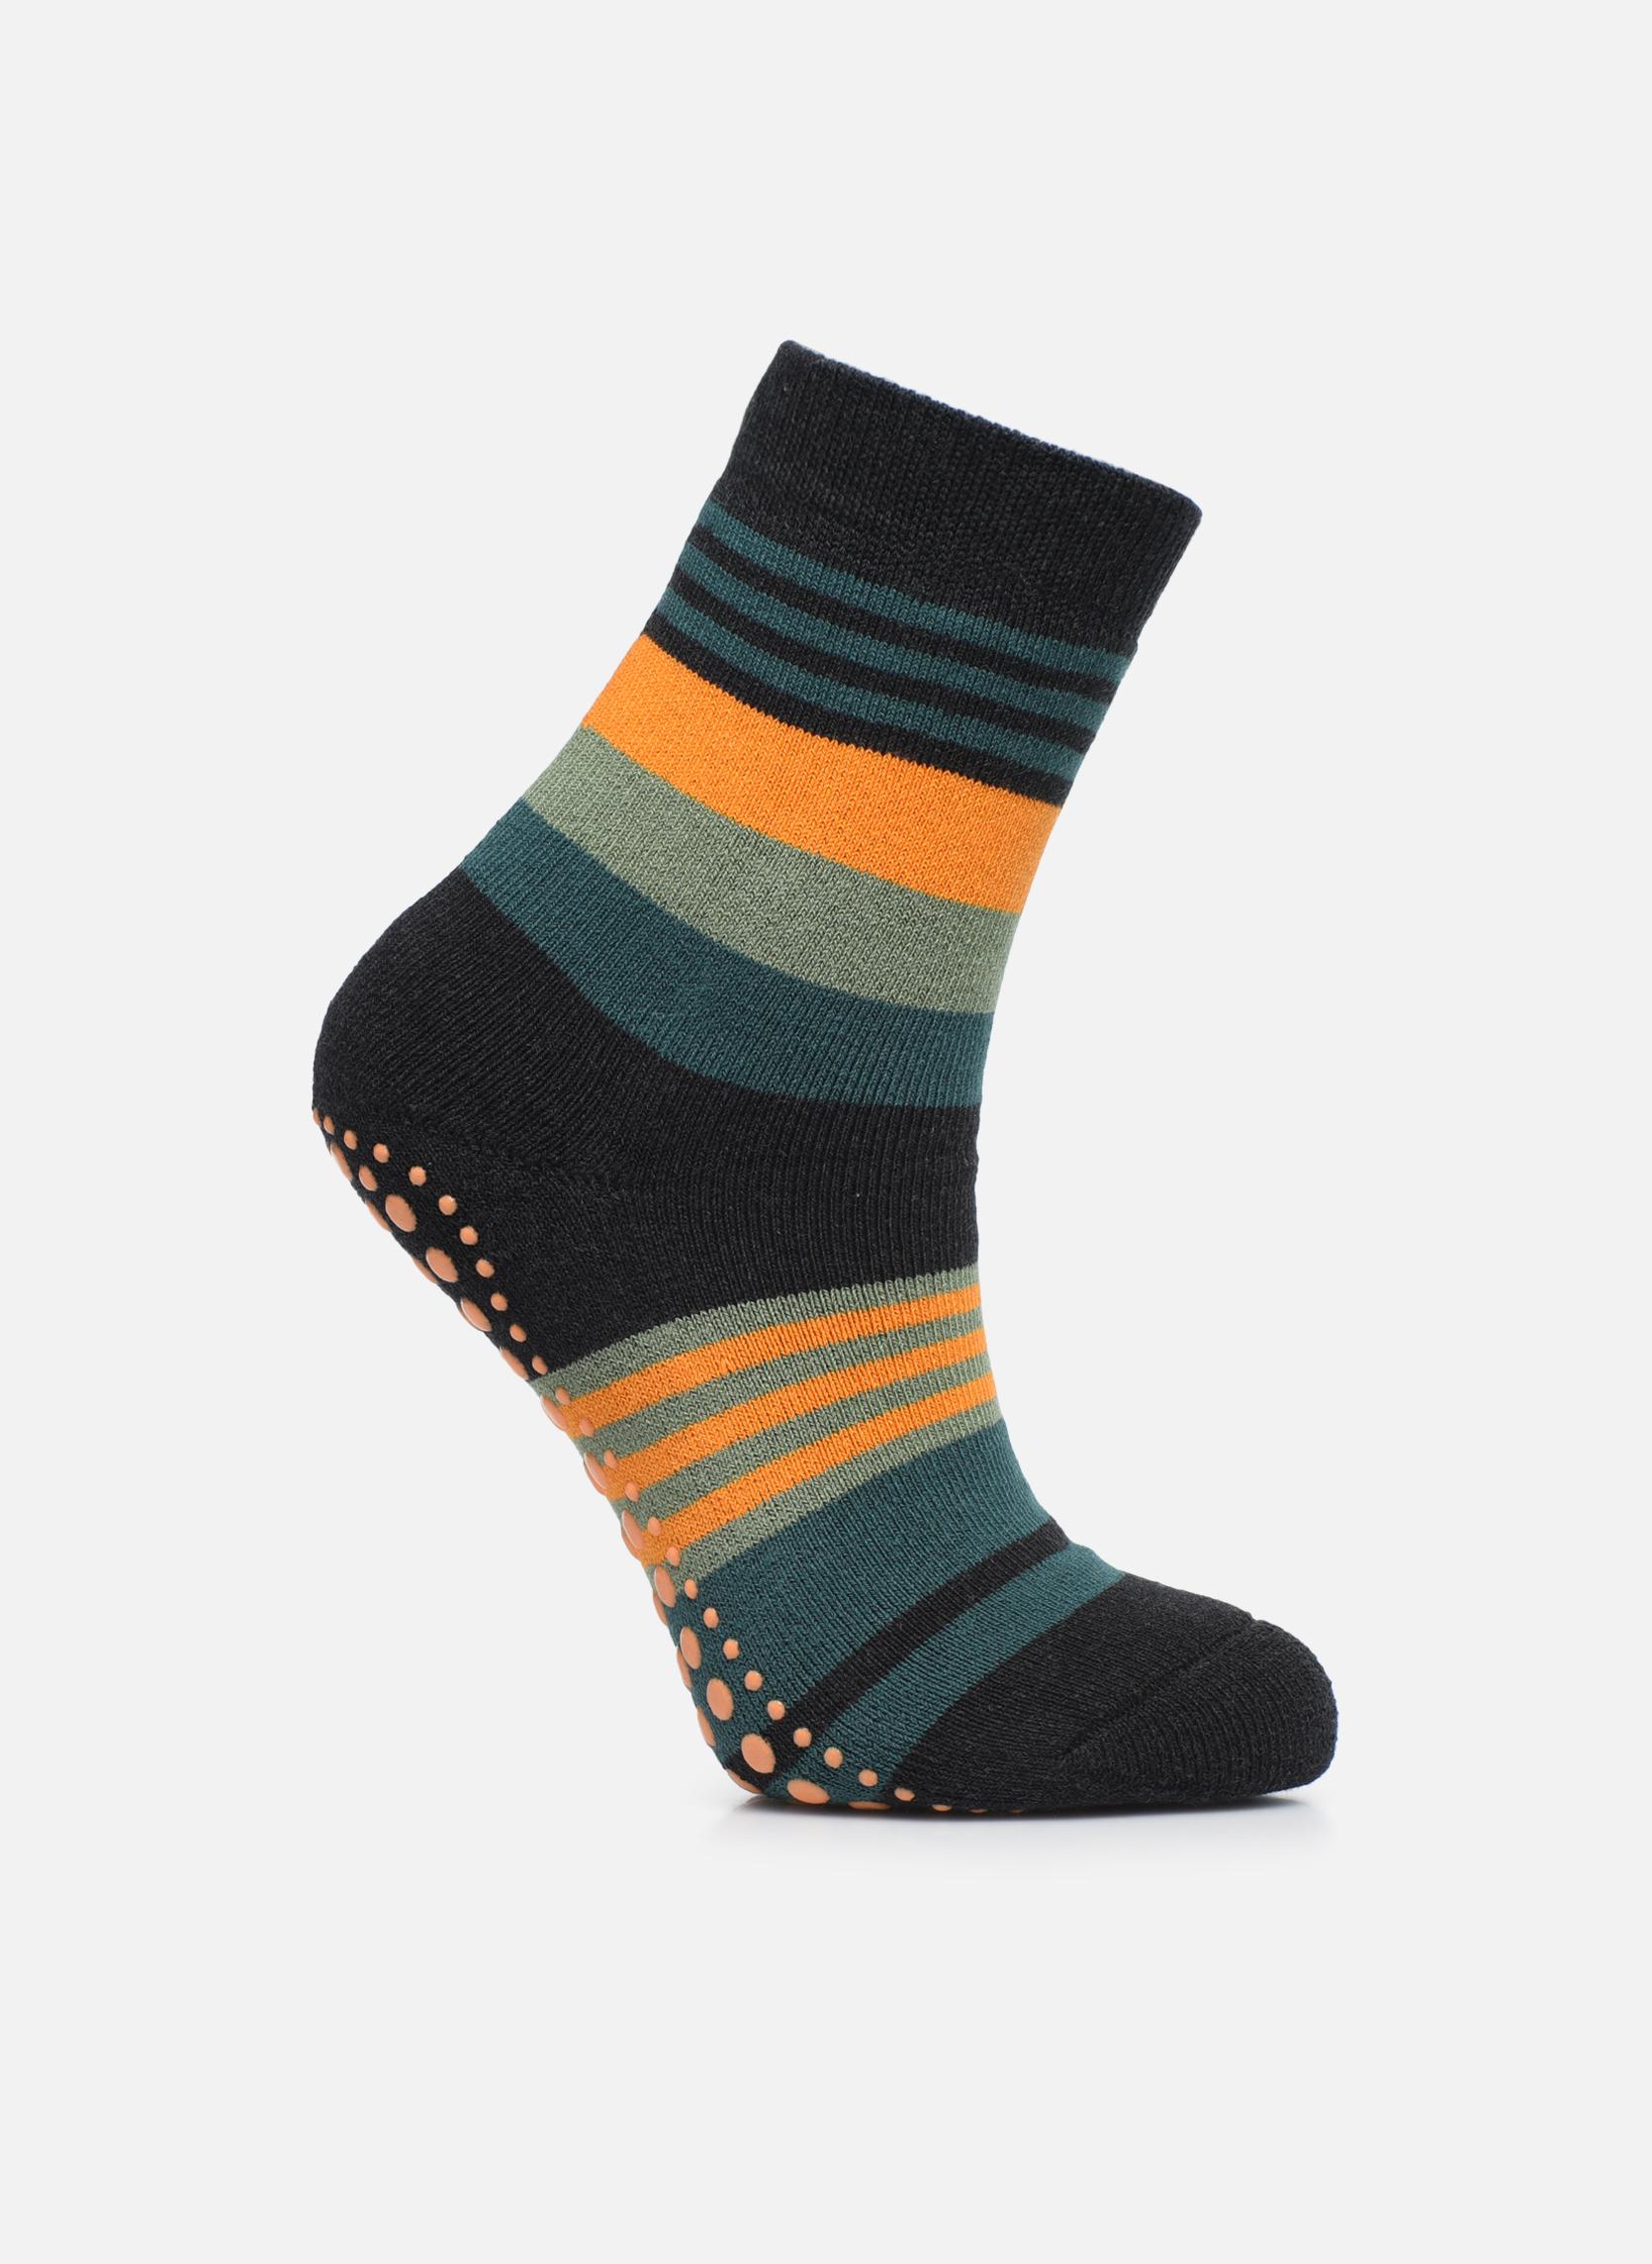 Chaussons-chaussettes Irregular Stripe Catspads 3080